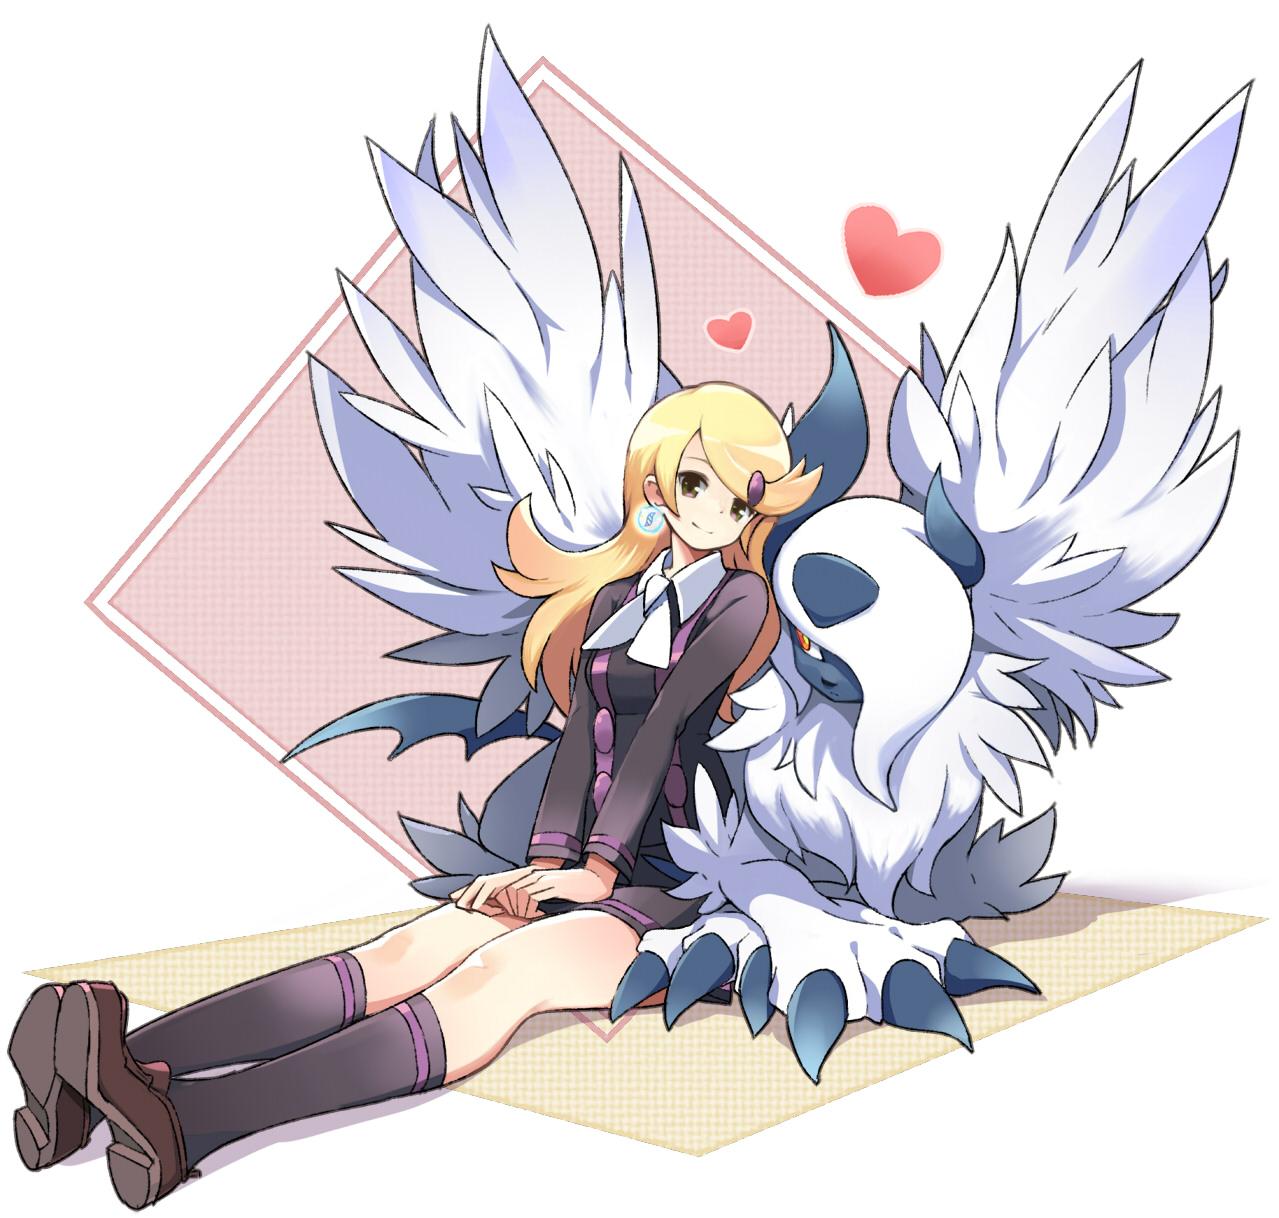 ace trainer pokémon zerochan anime image board